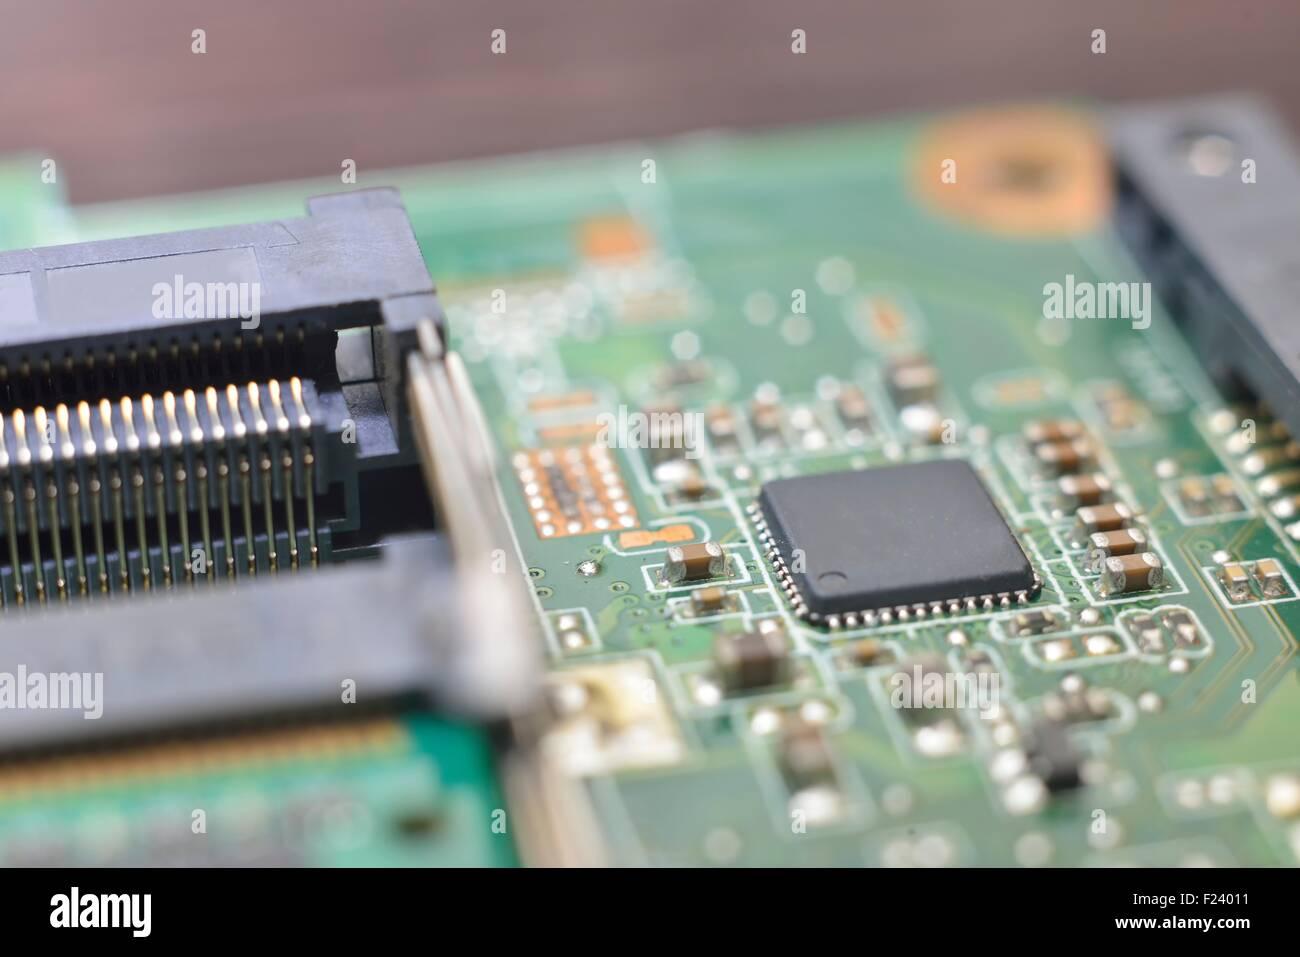 Computer Motherboard Bios Chip Stock Photos & Computer